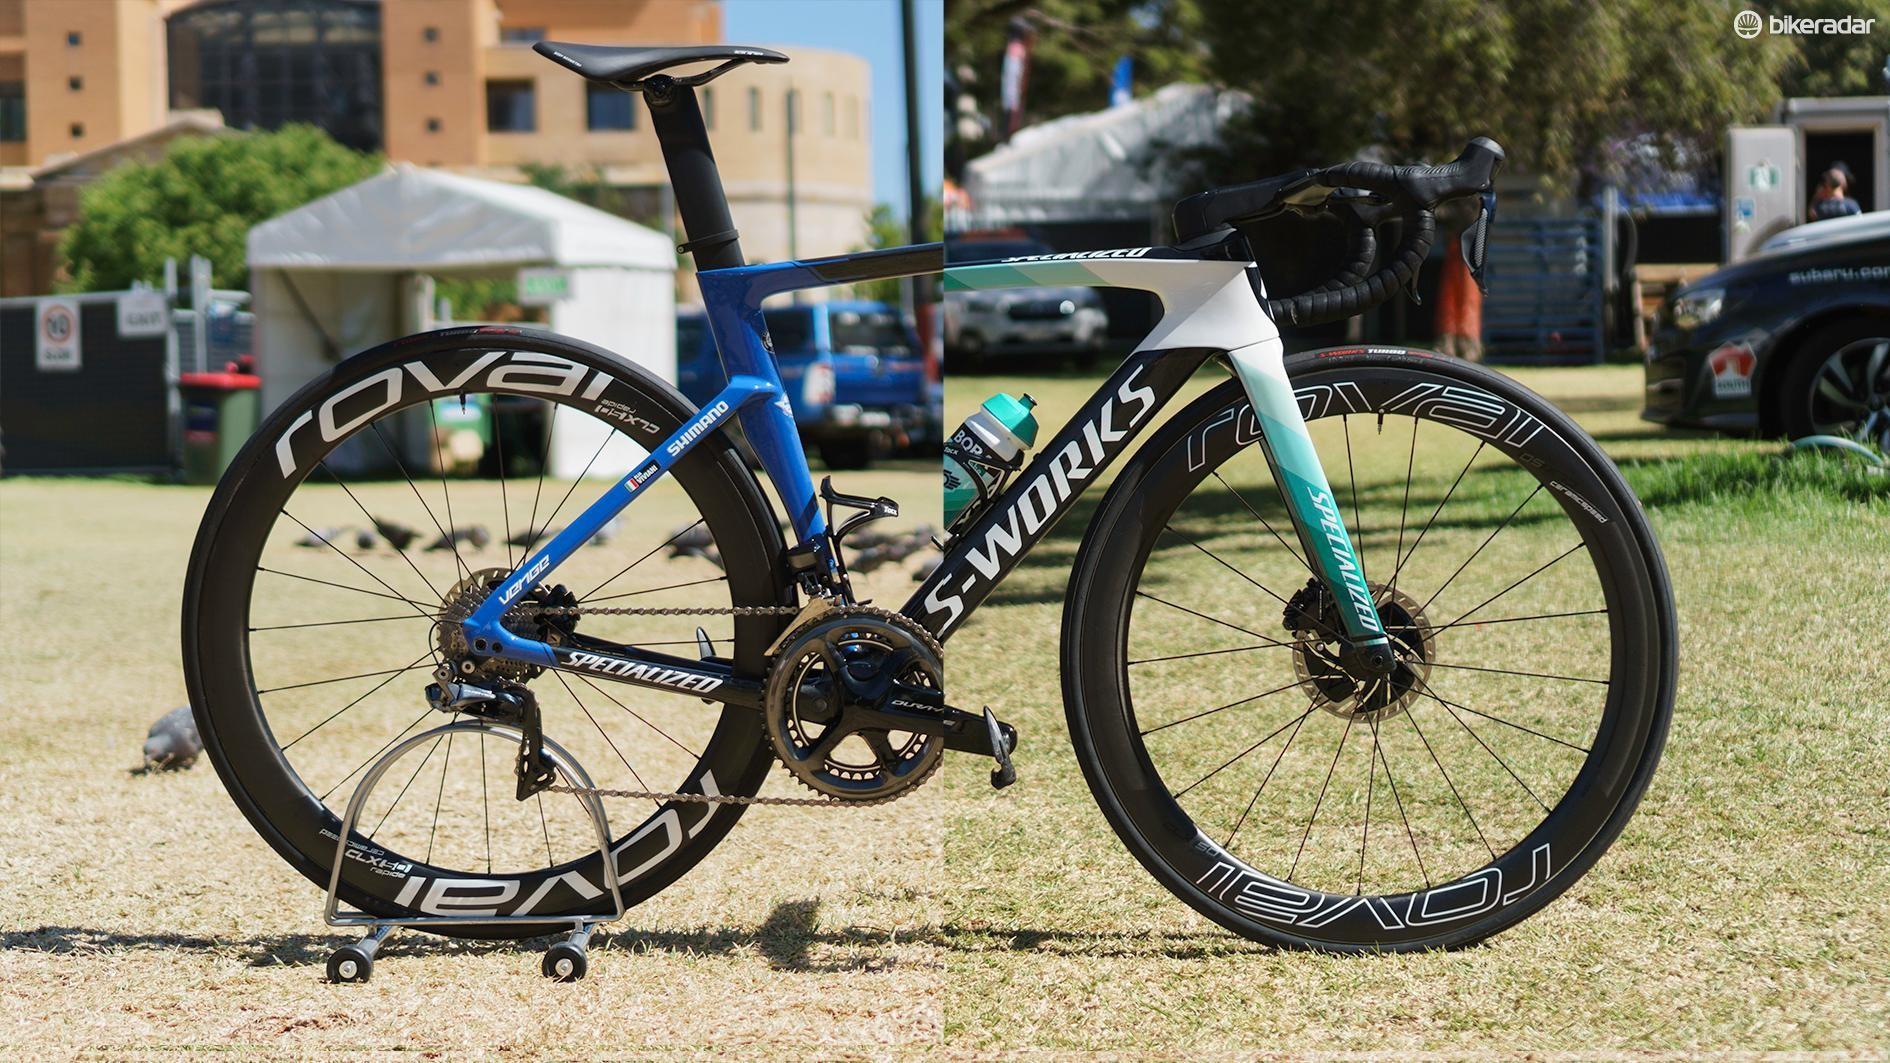 Through the magic of Photoshop, BikeRadar introduces the S-Works Venge WorldTour Team Hybrid